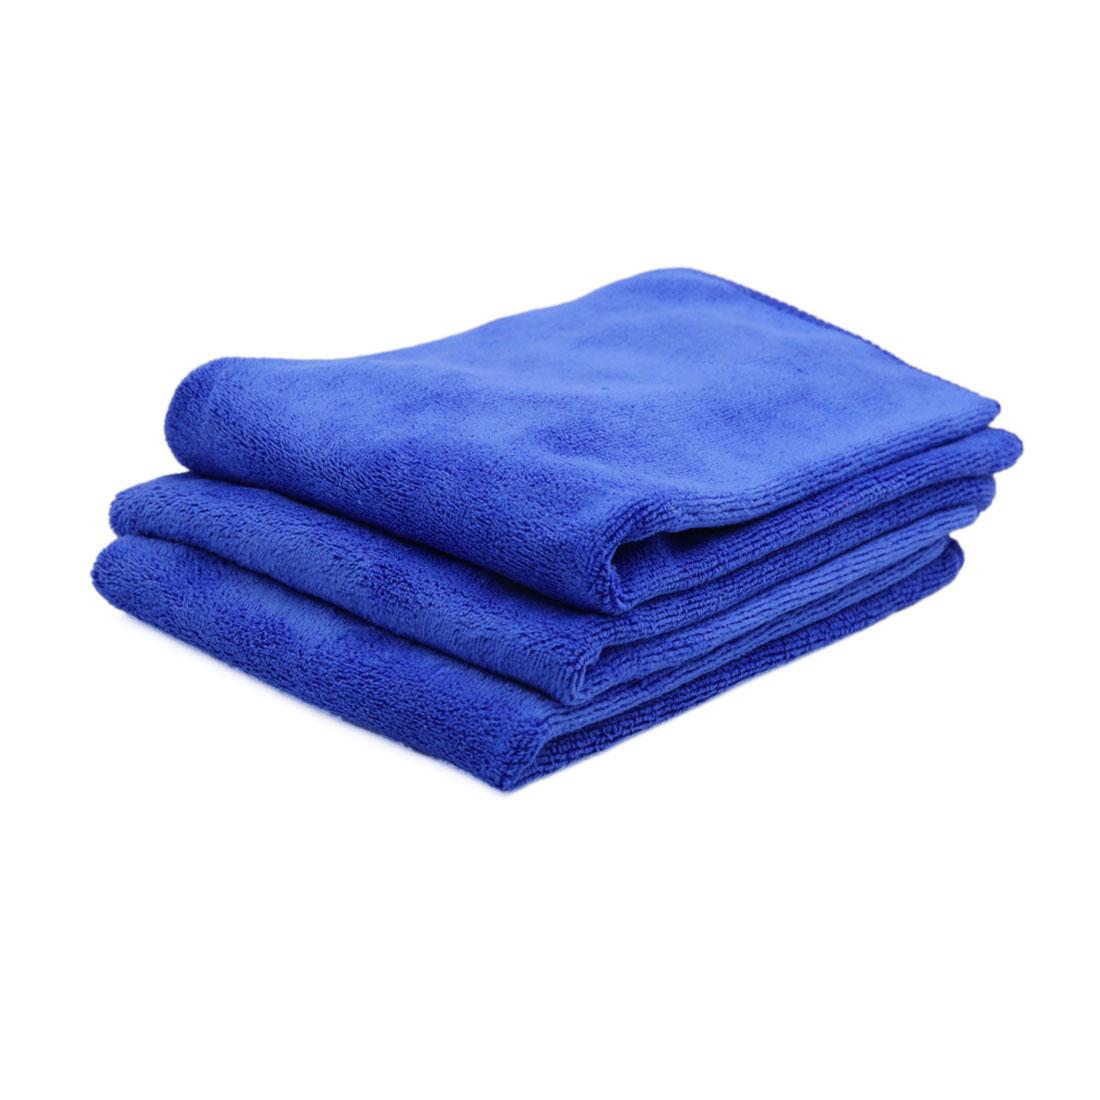 3pcs 40 x 40cm 400GSM Microfiber Car Cleaning Towels Drying Washing Cloth Green